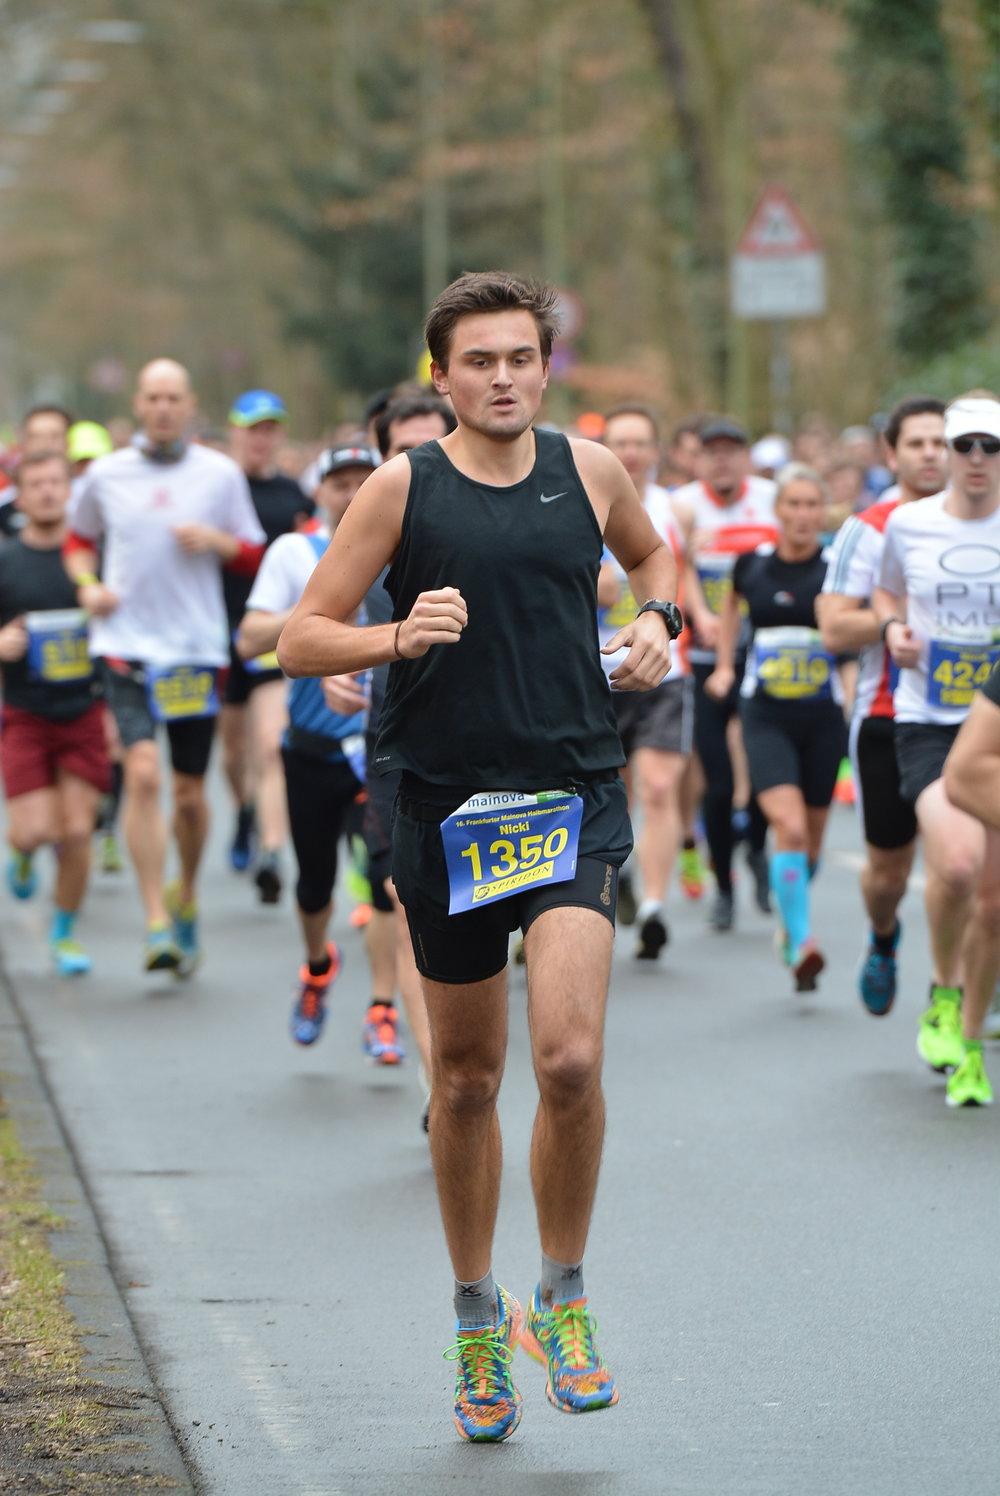 Nicki-Lange-Frankfurt-Half-Marathon-2018-3.jpg